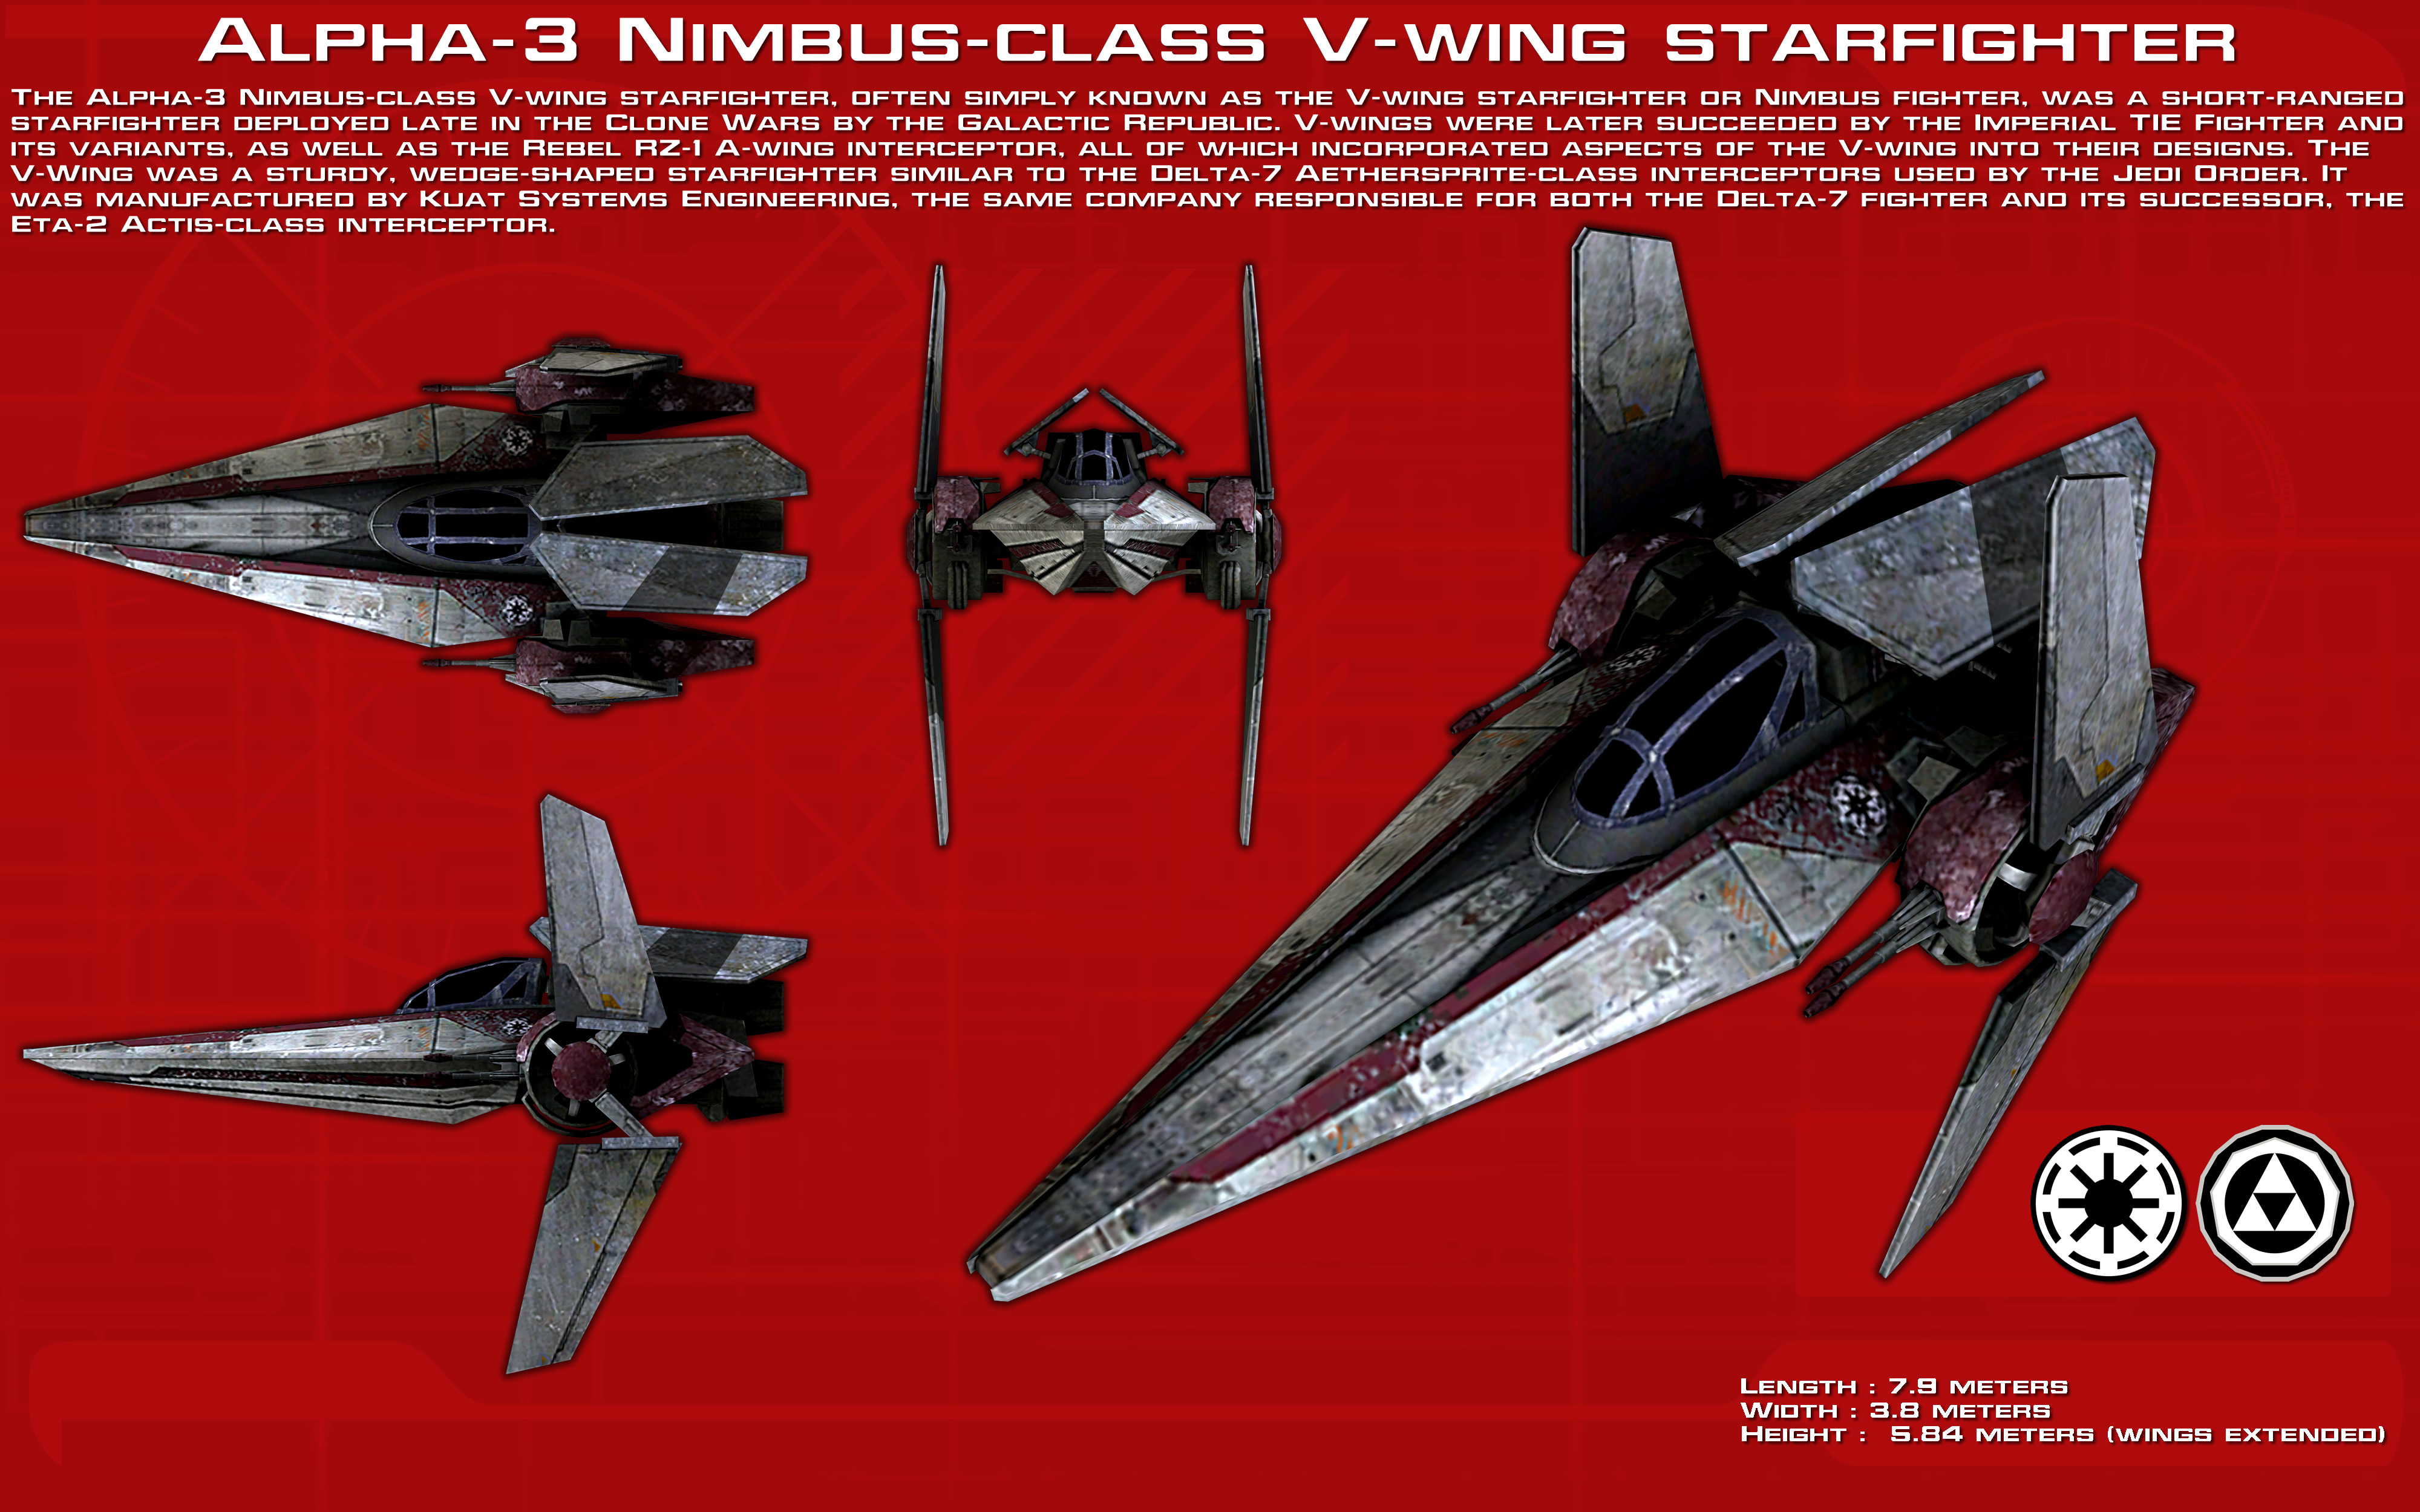 V-Wing Starfighter ortho [1][New] by unusualsuspex on DeviantArt